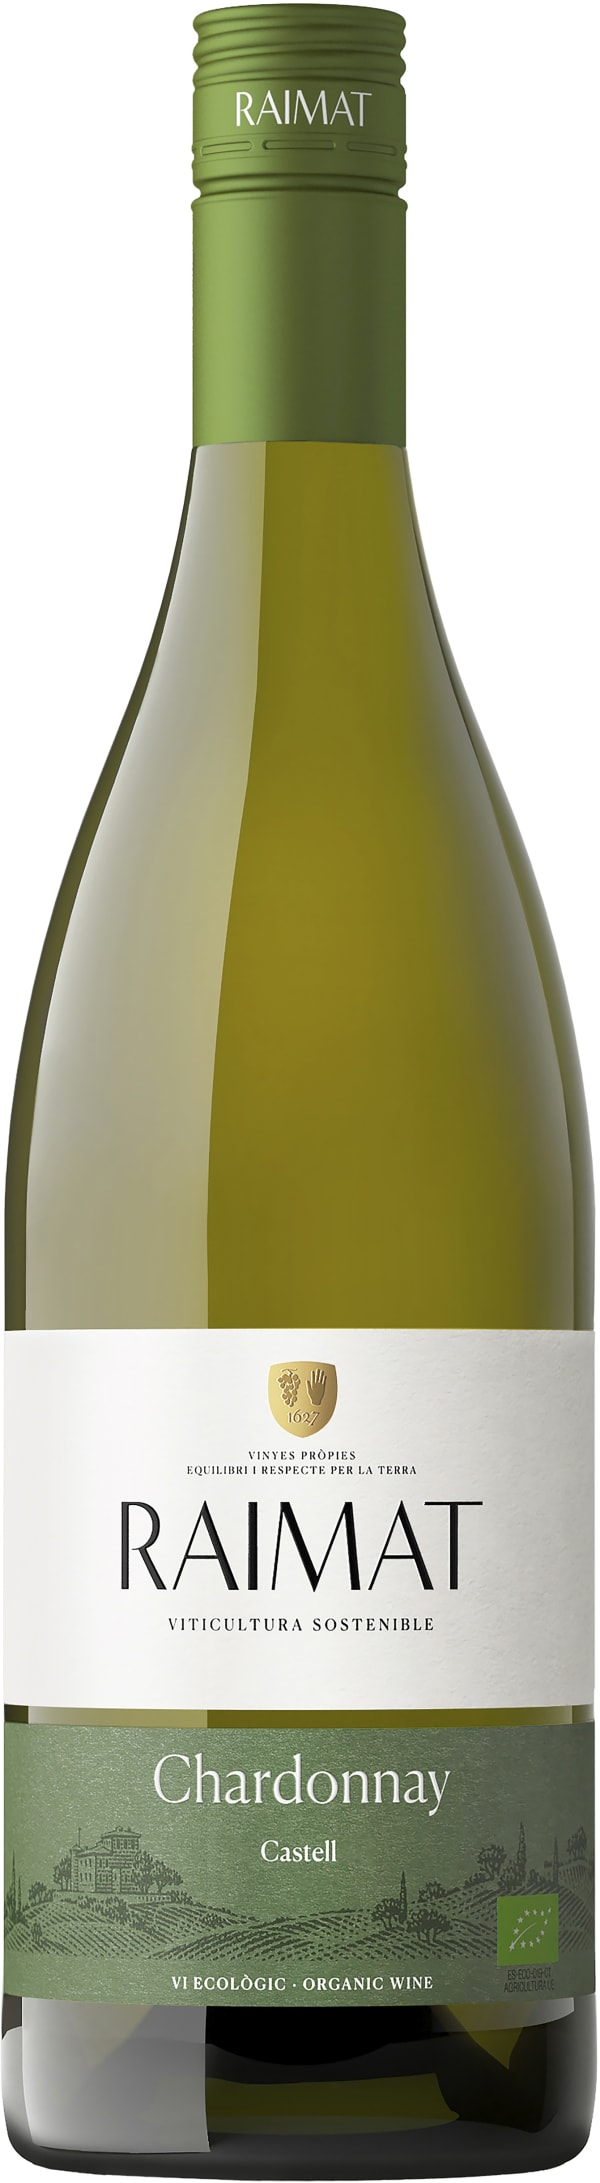 Raimat Castell Chardonnay Organic 2018